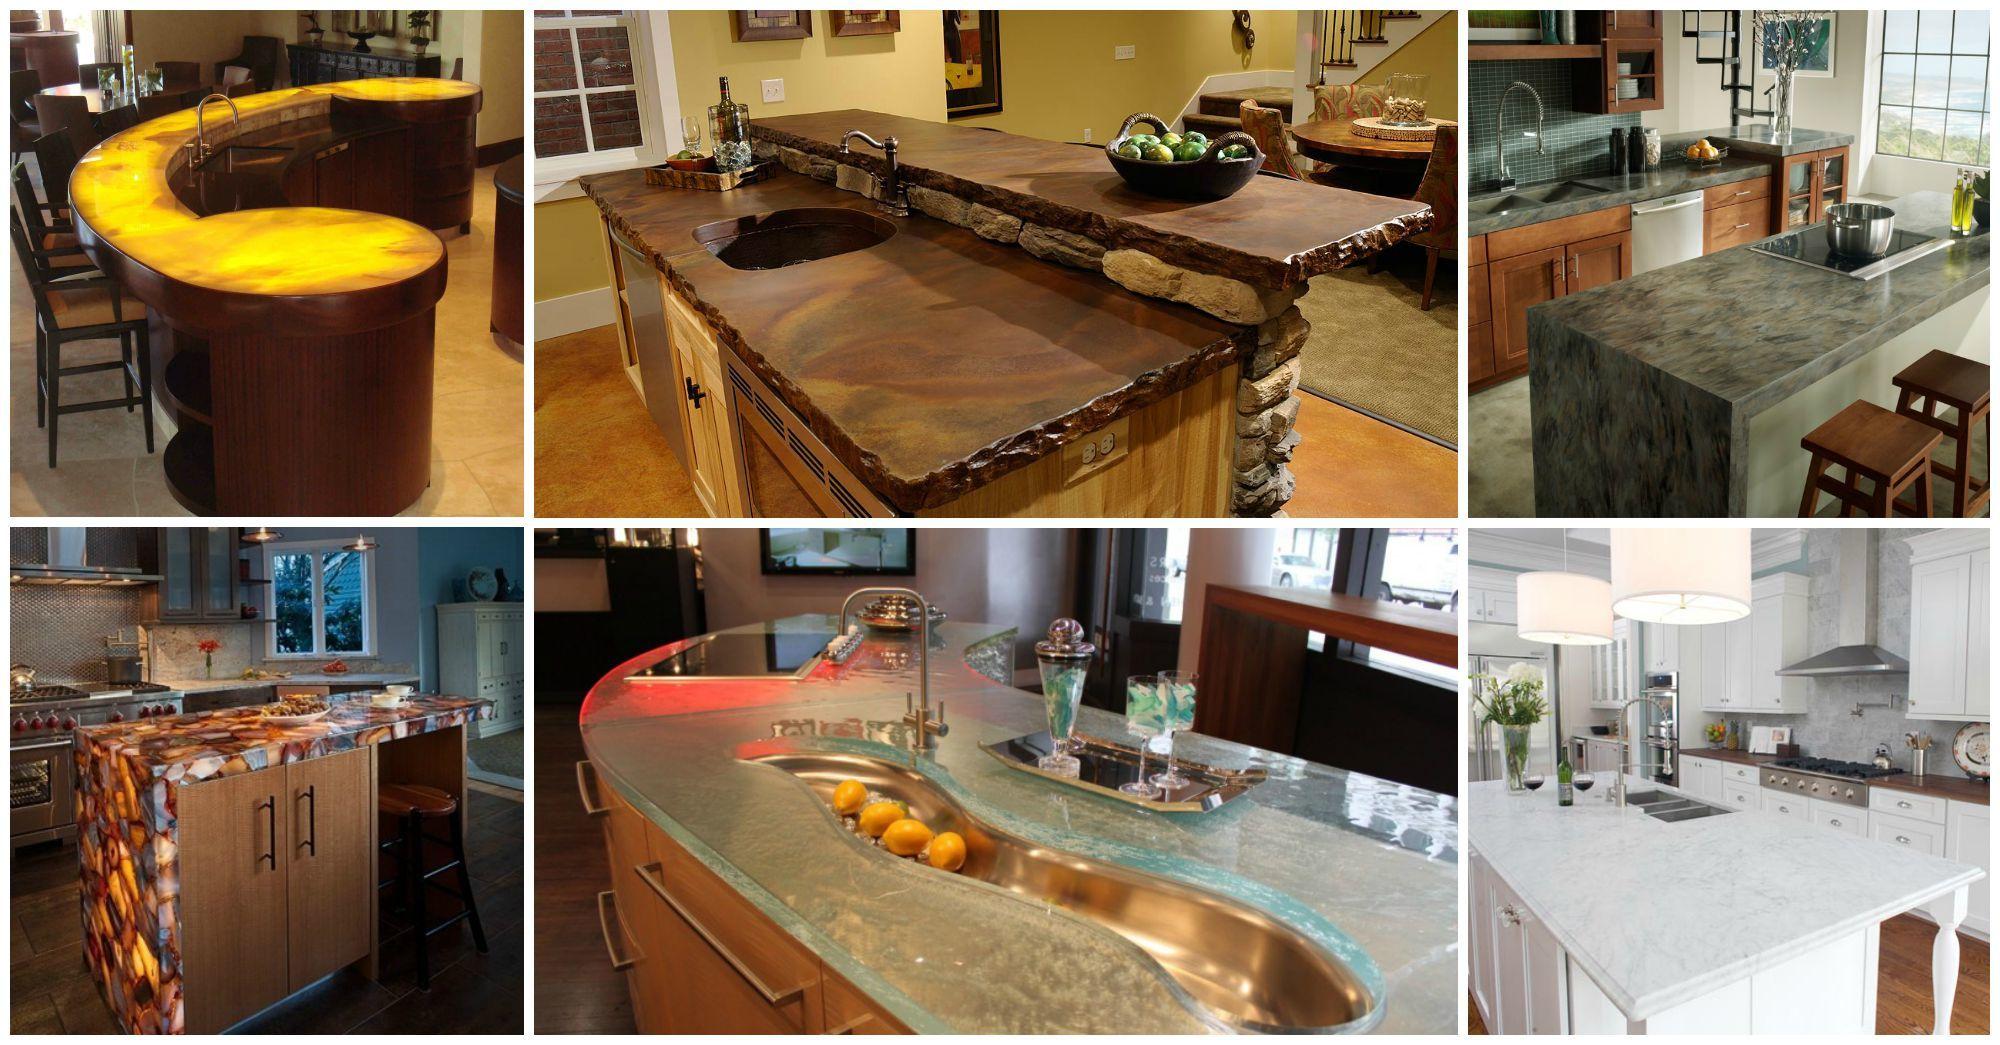 10 Astonishing Kitchen Countertops You Should Not Miss